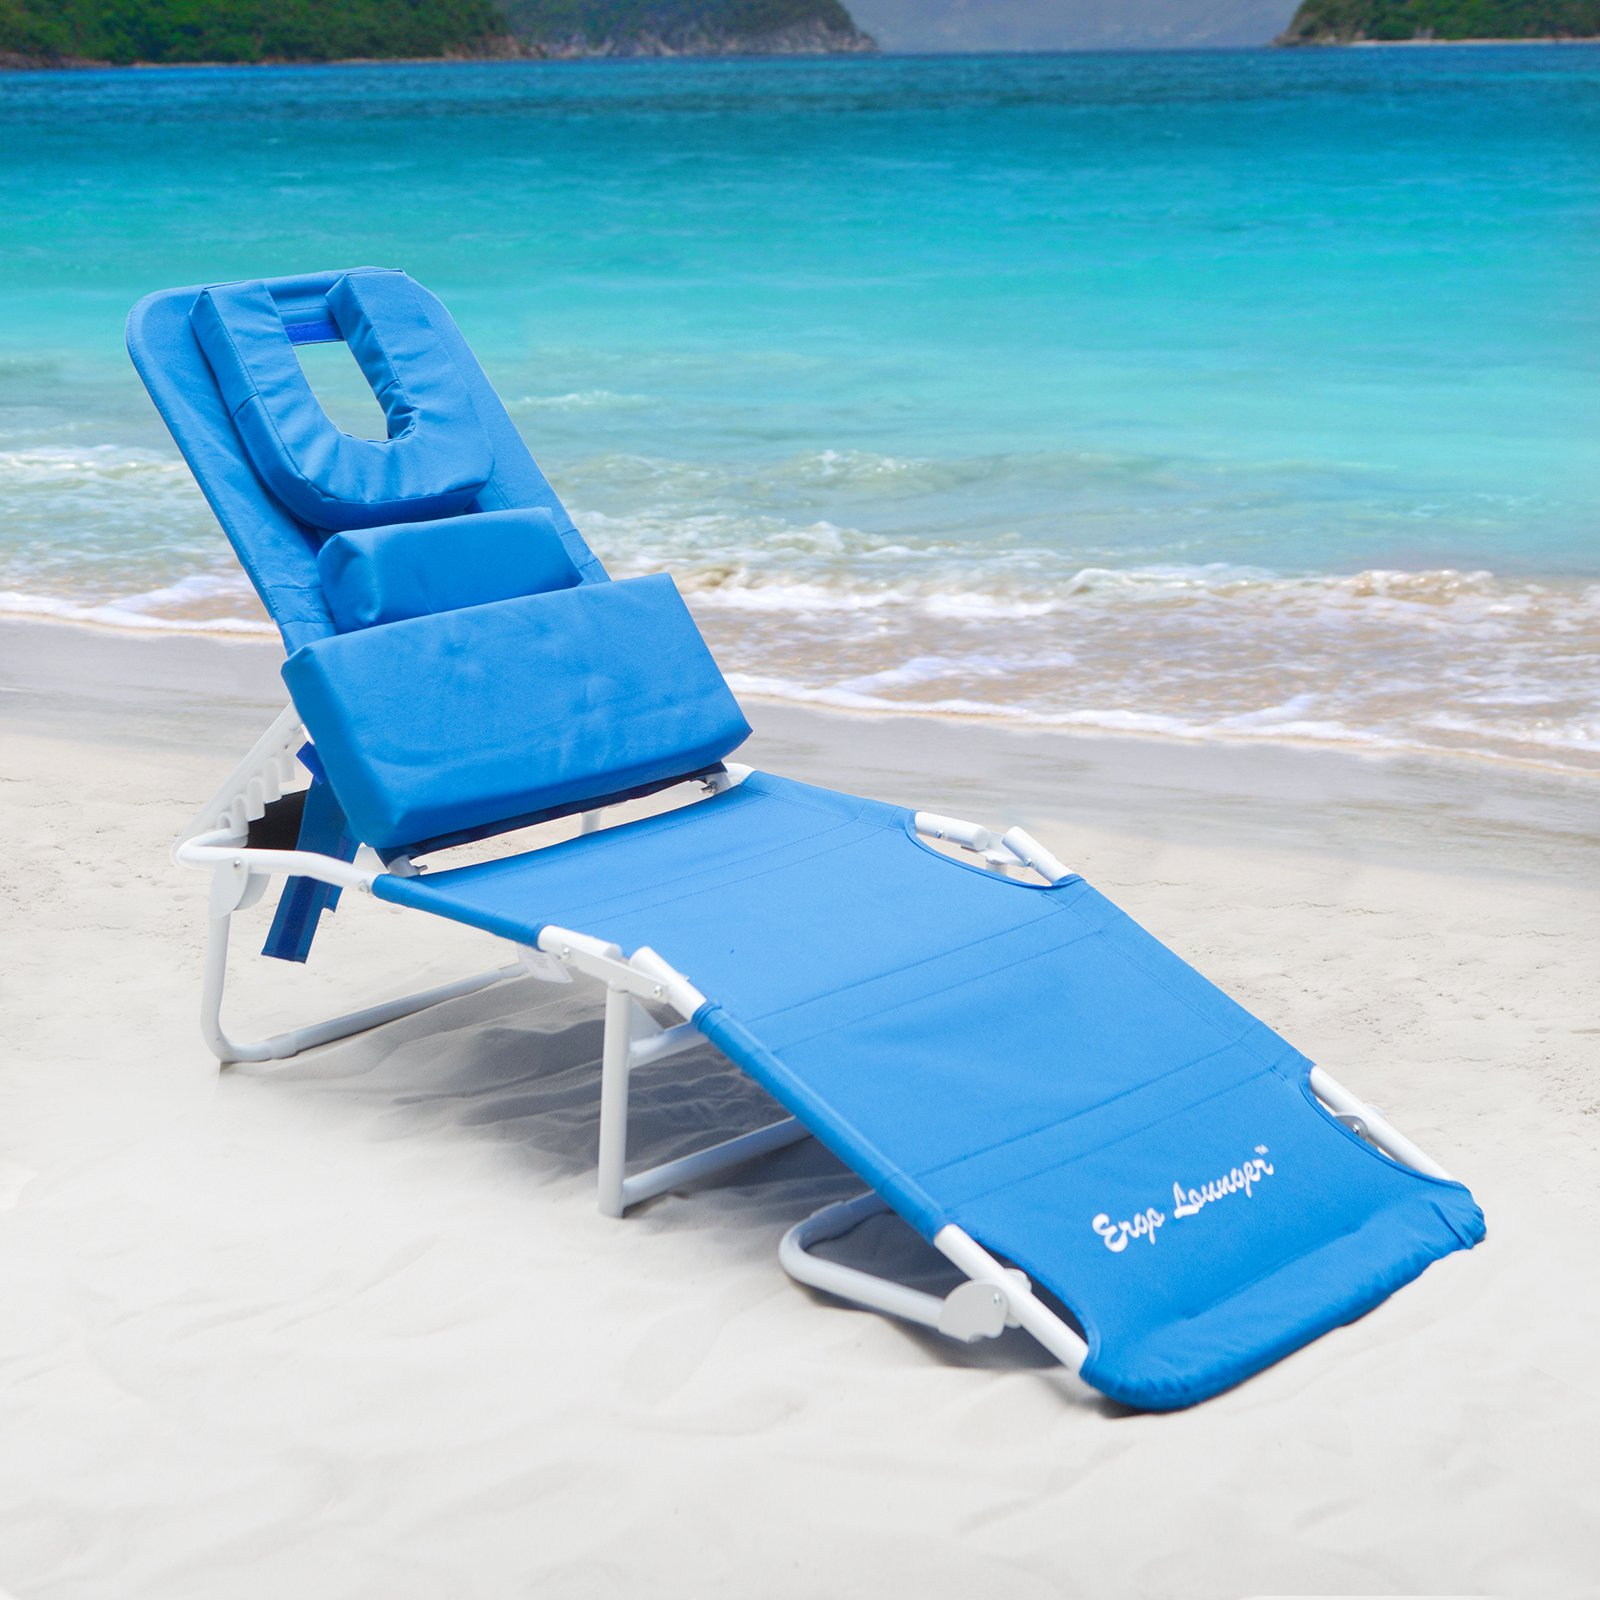 Ergo Lounger Rs Beach Chaise Lounge